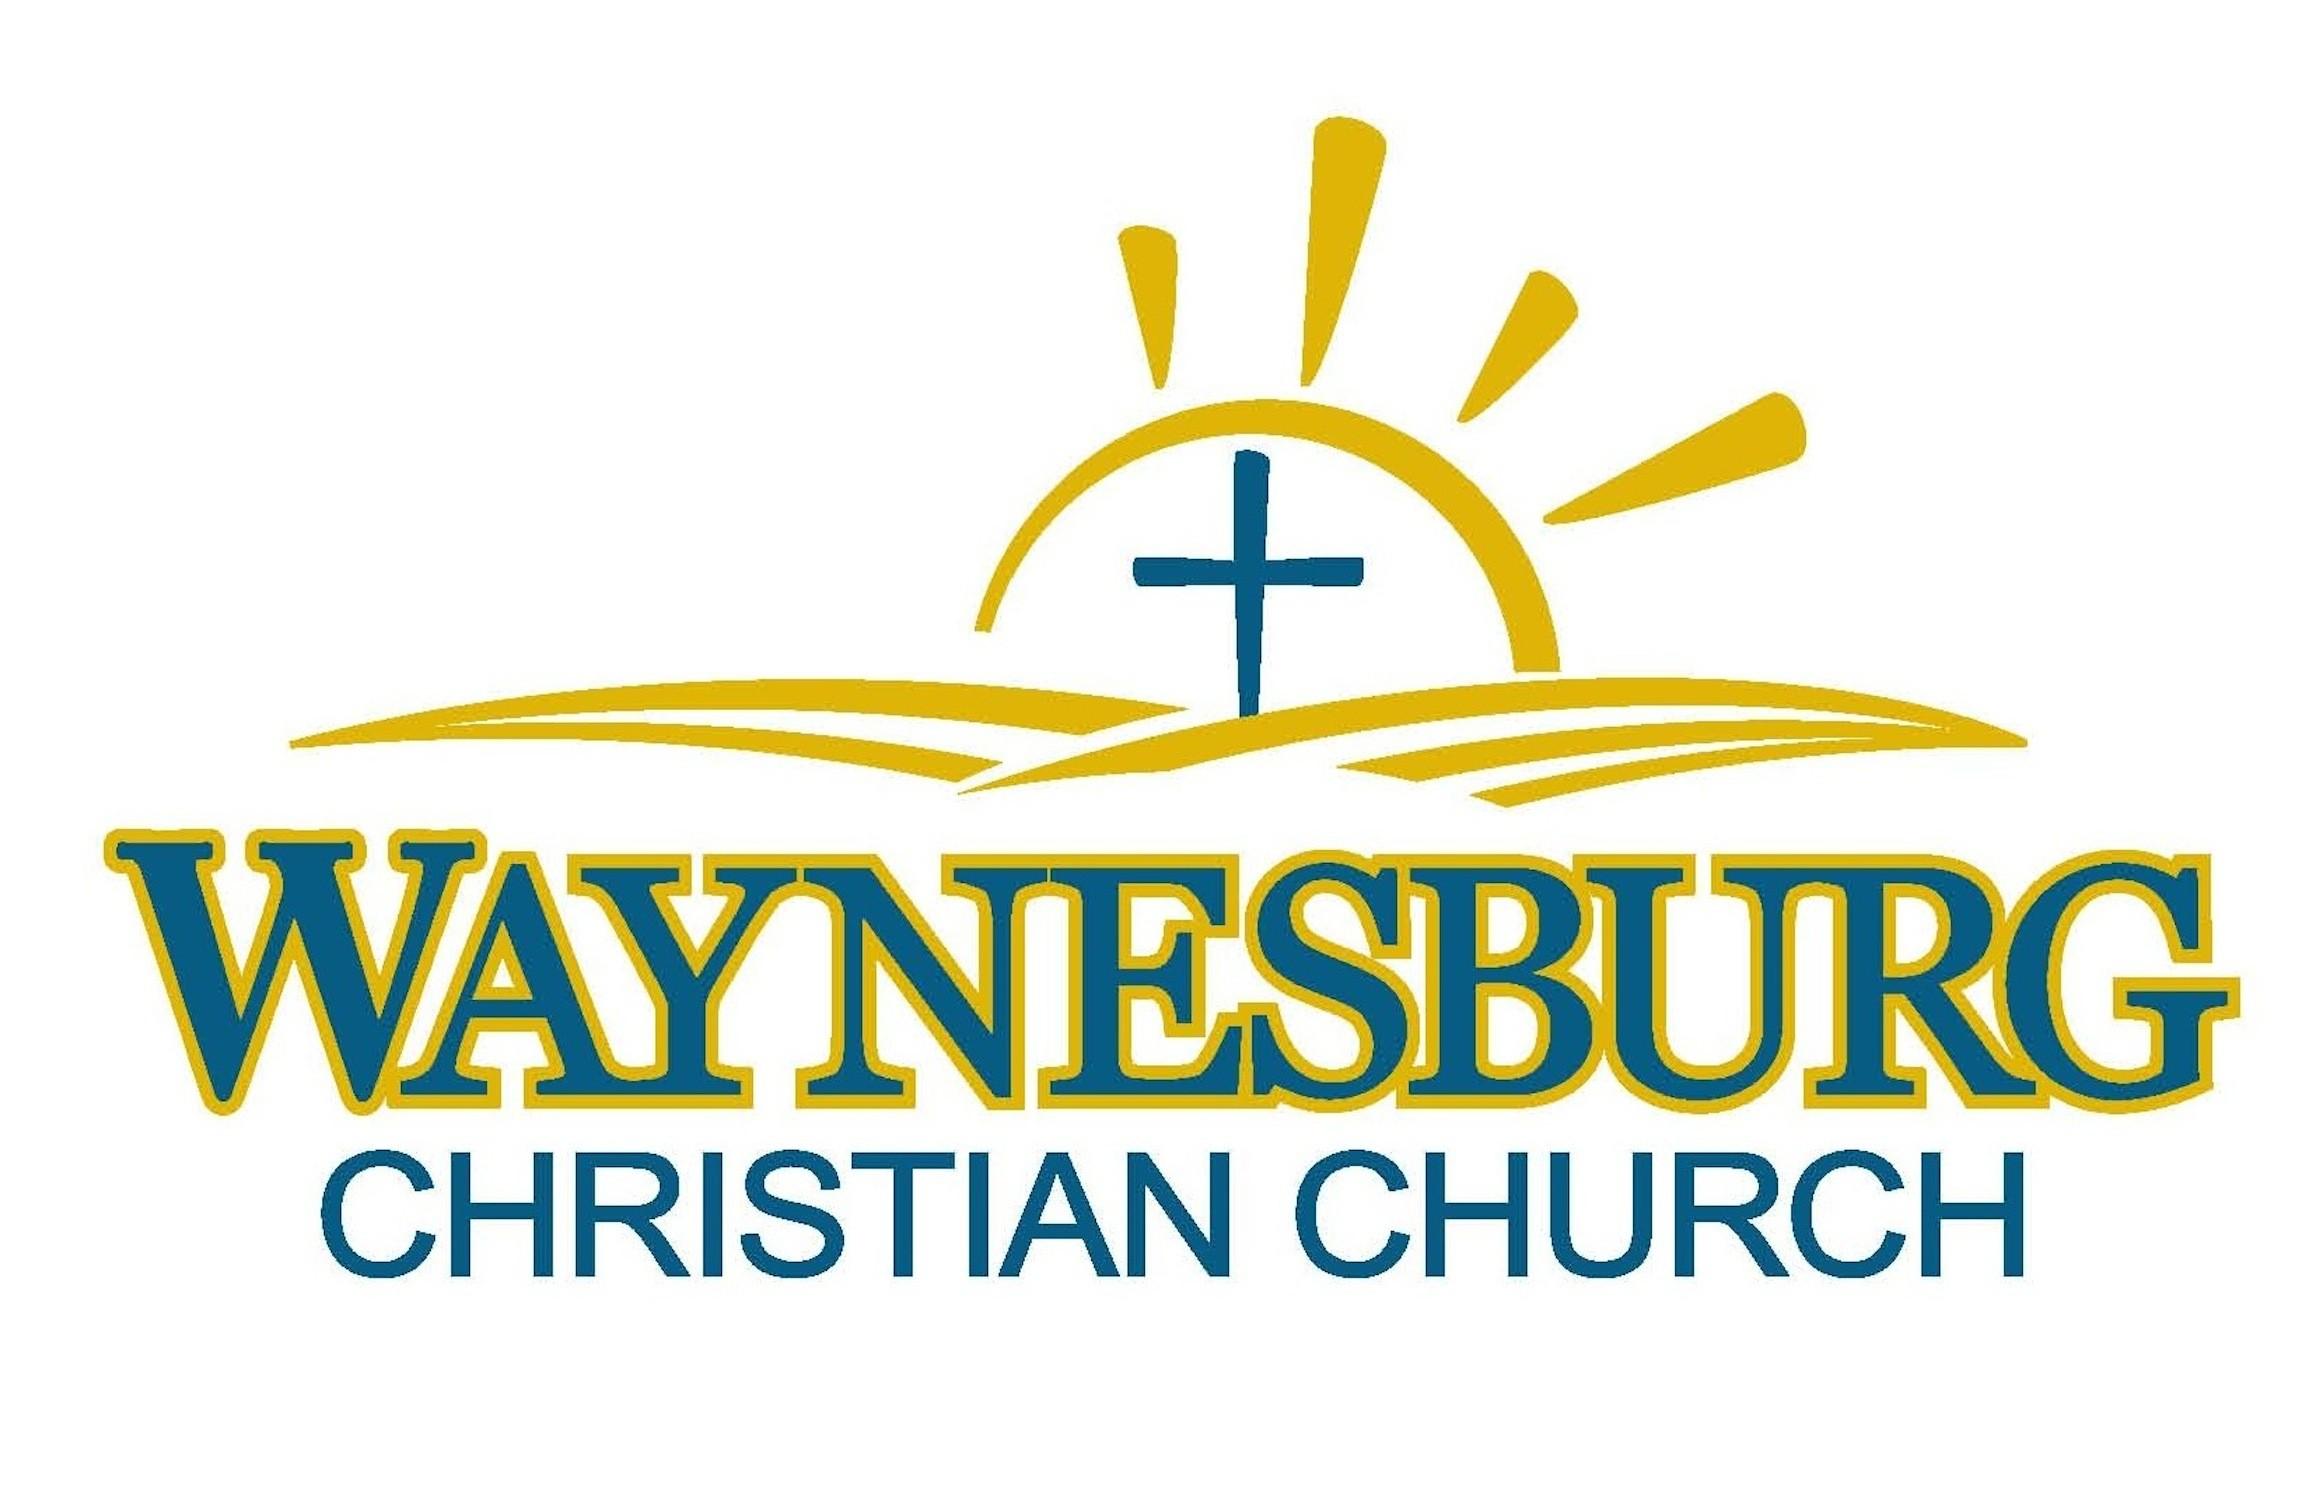 Waynesburg Christian Church